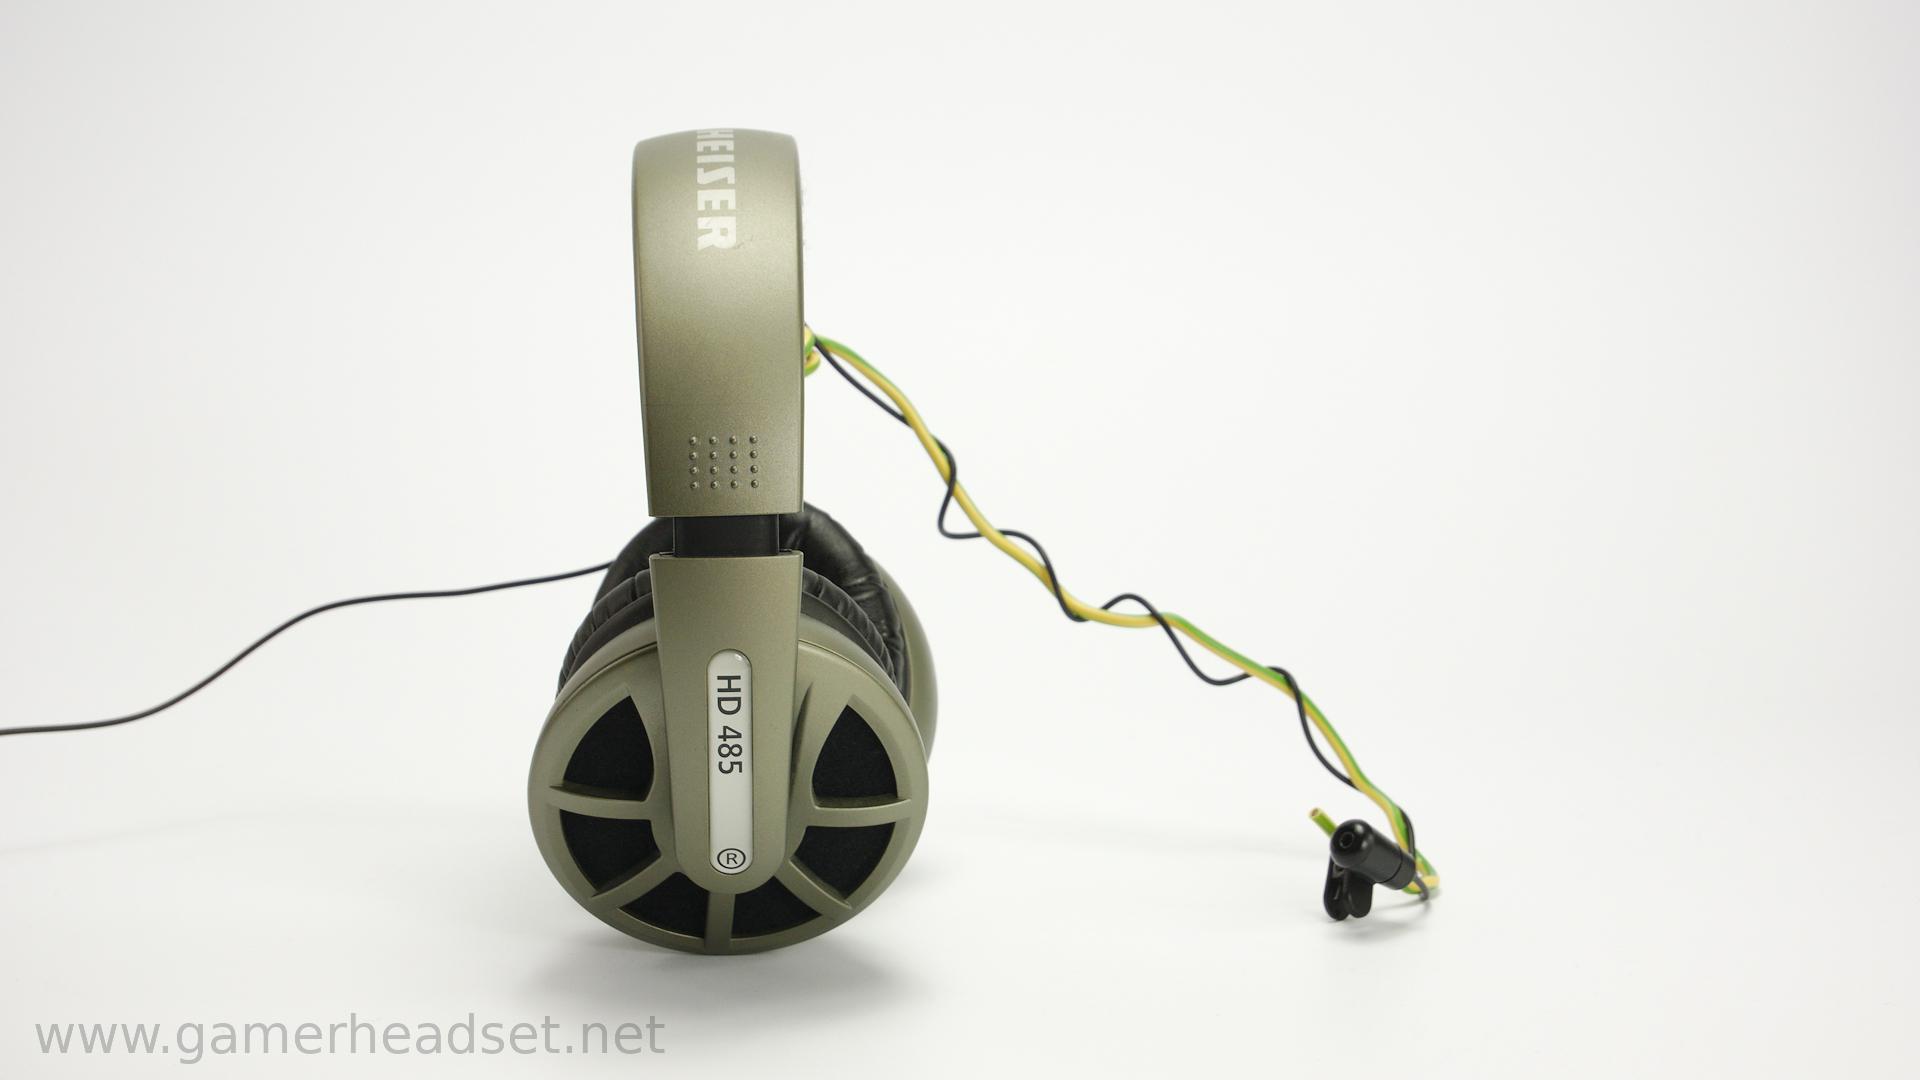 Erfreut Stereo Headset Mit Mikrofonschaltplan Fotos - Elektrische ...